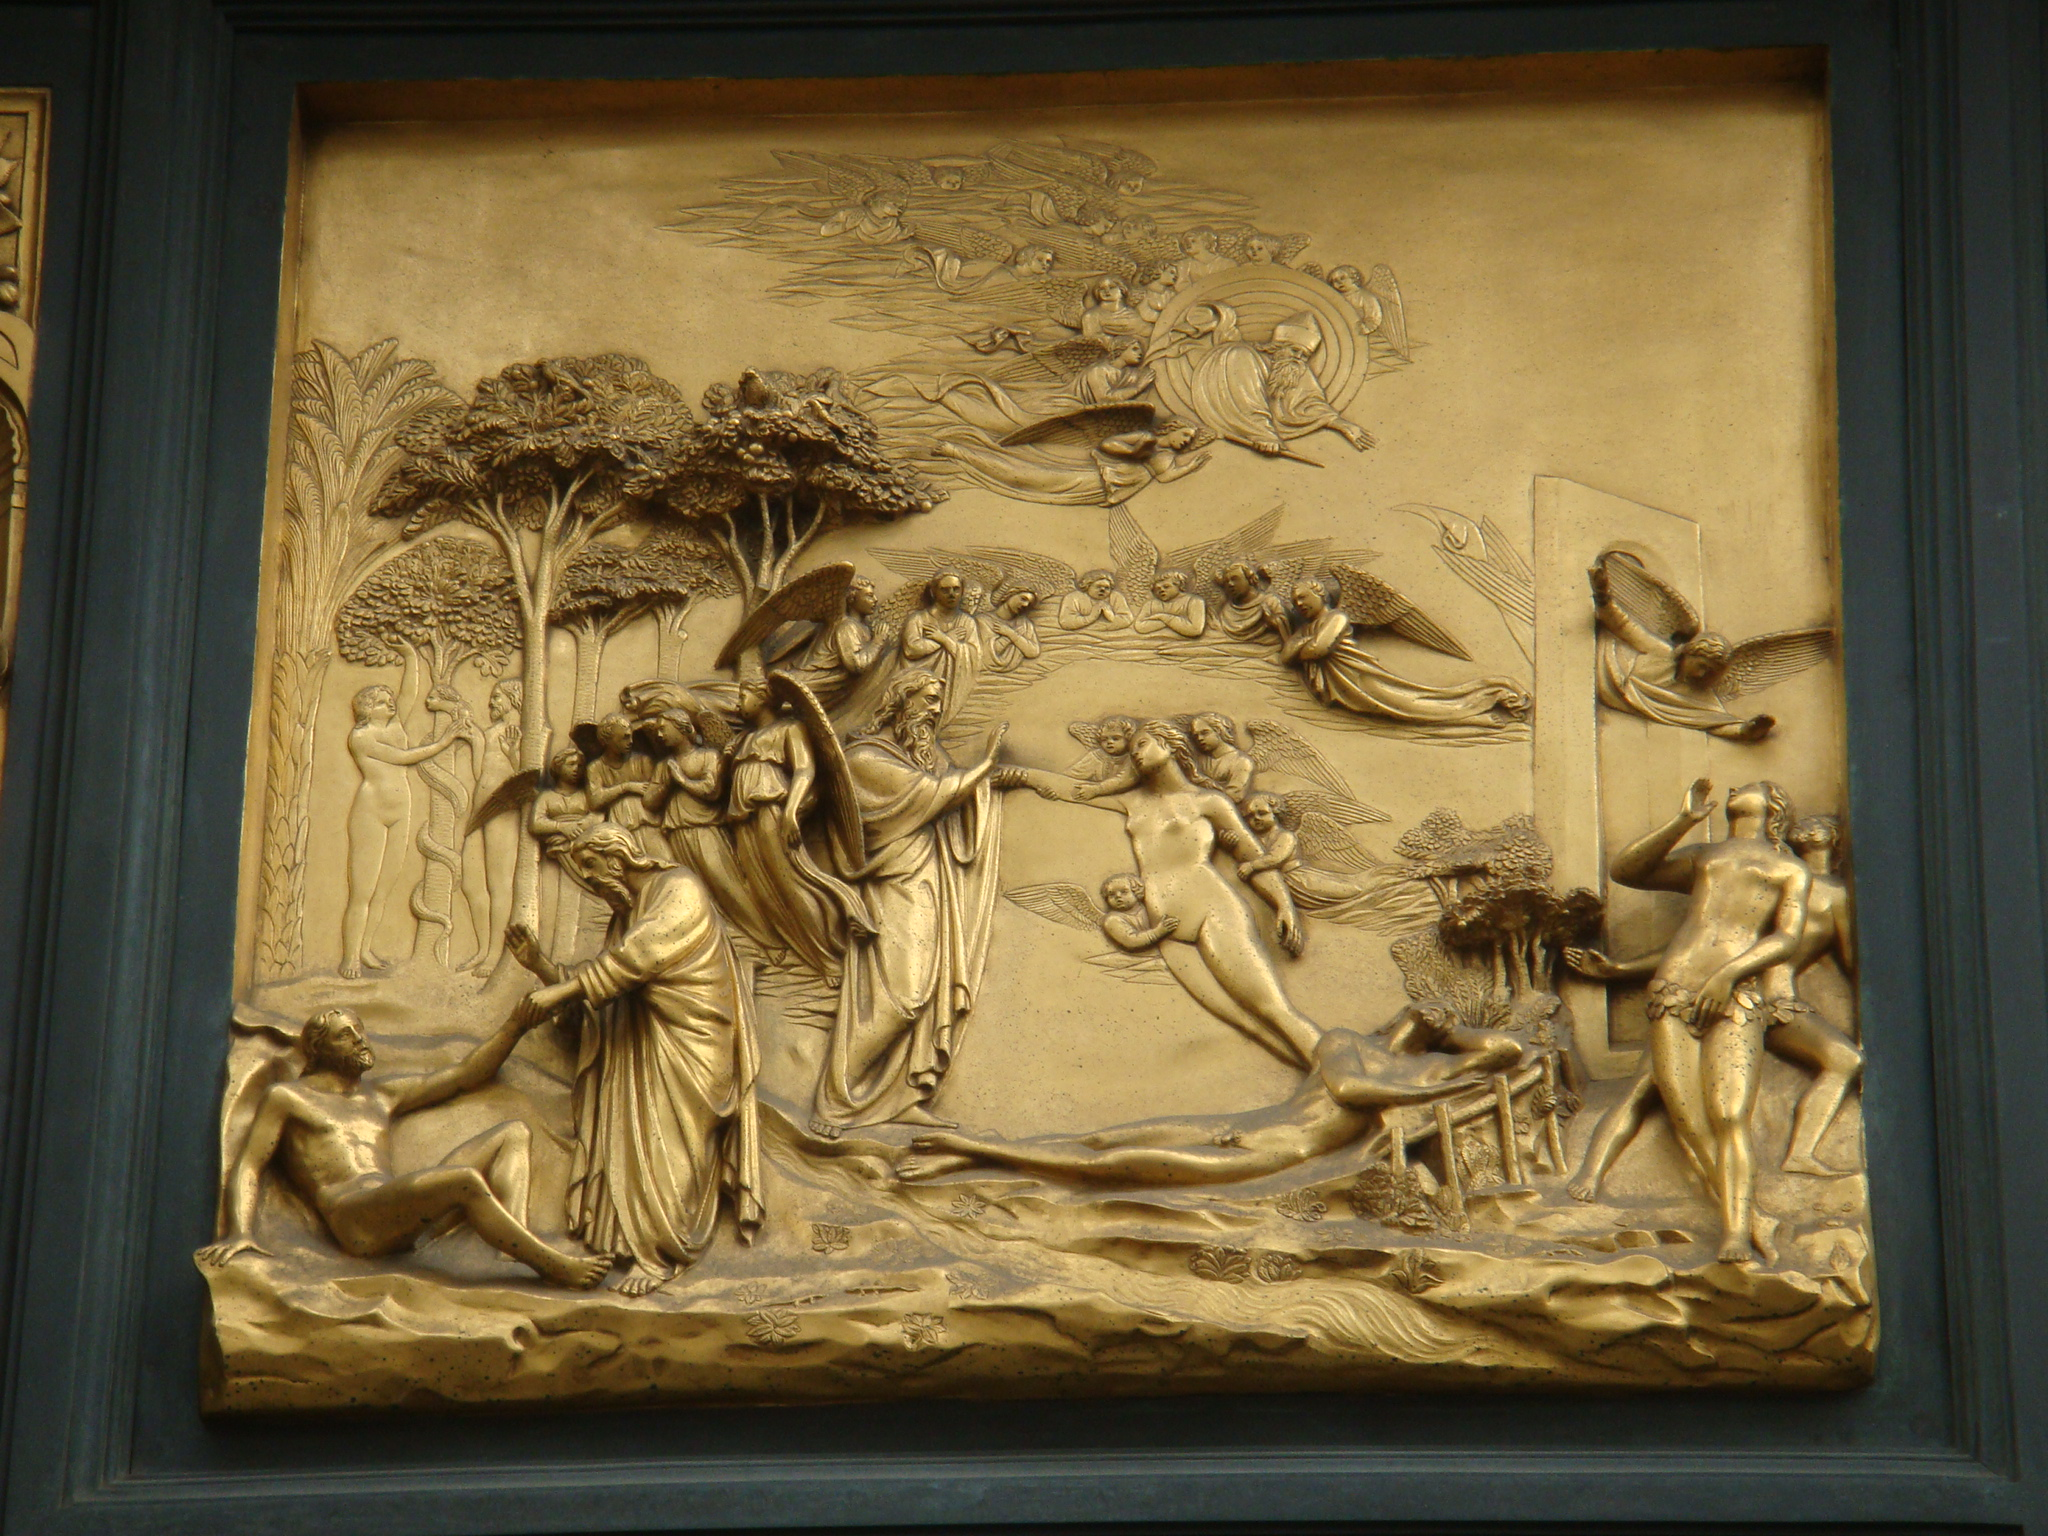 Ghiberti\u0027s Gates of Paradise at the Baptistry in Florence Italy & Ghiberti\u0027s Gates of Paradise: Florence Art History 101 - Vino Con ... Pezcame.Com